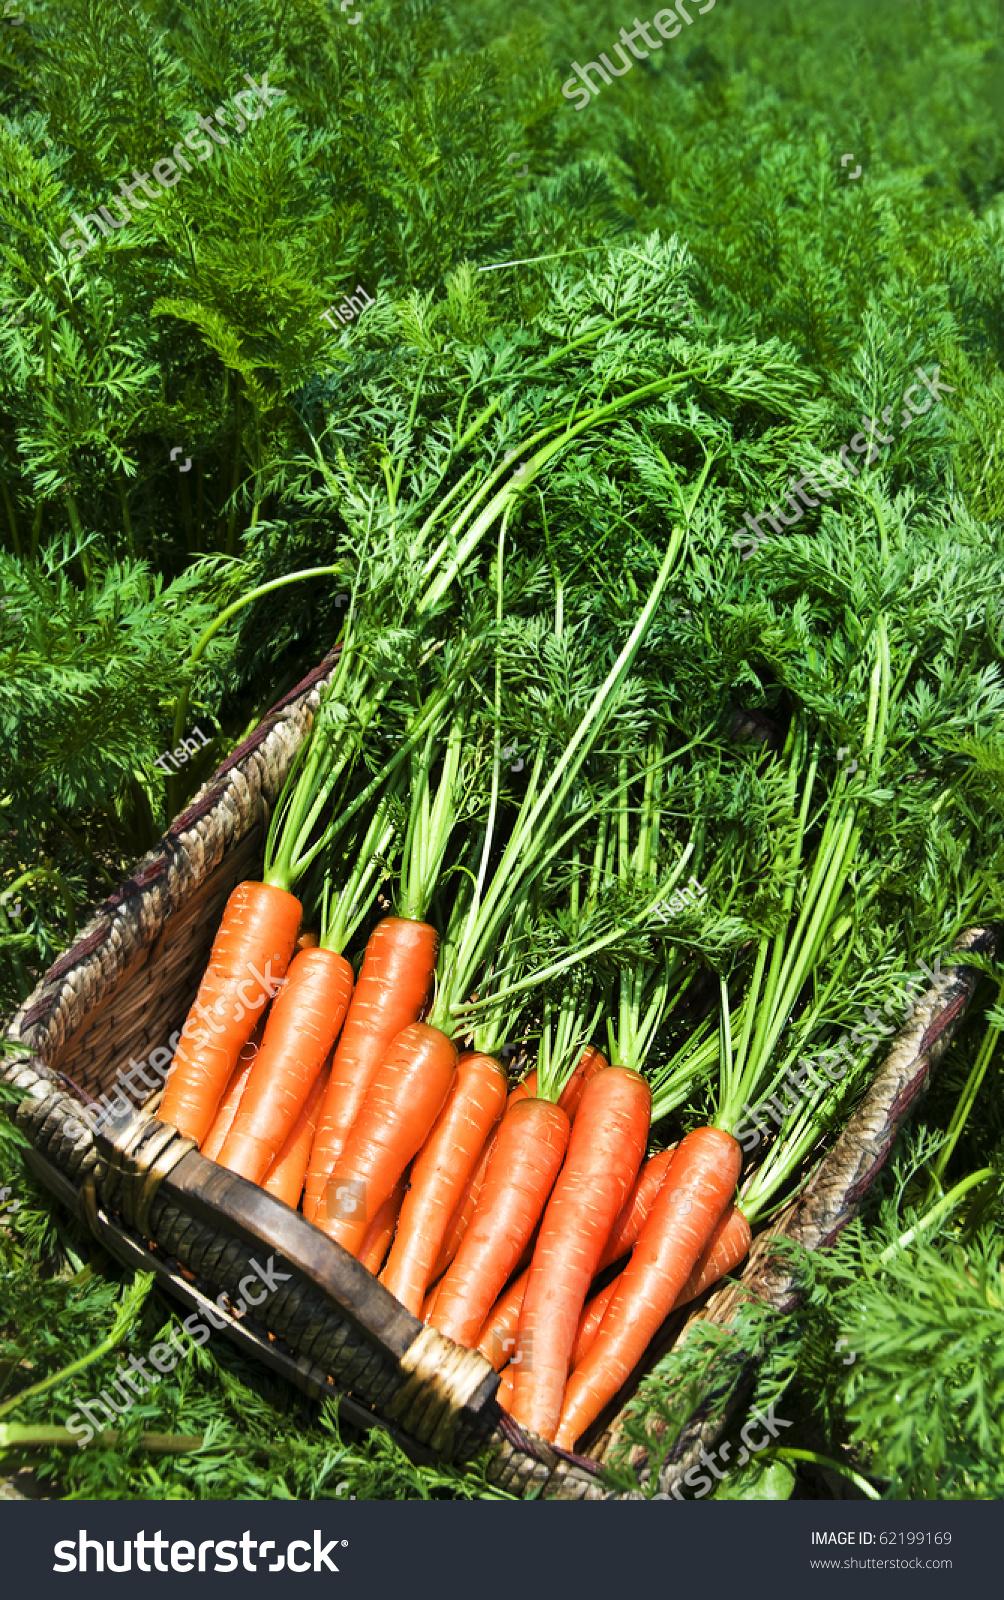 Carrot Field Stock Photo - Image: 74146478